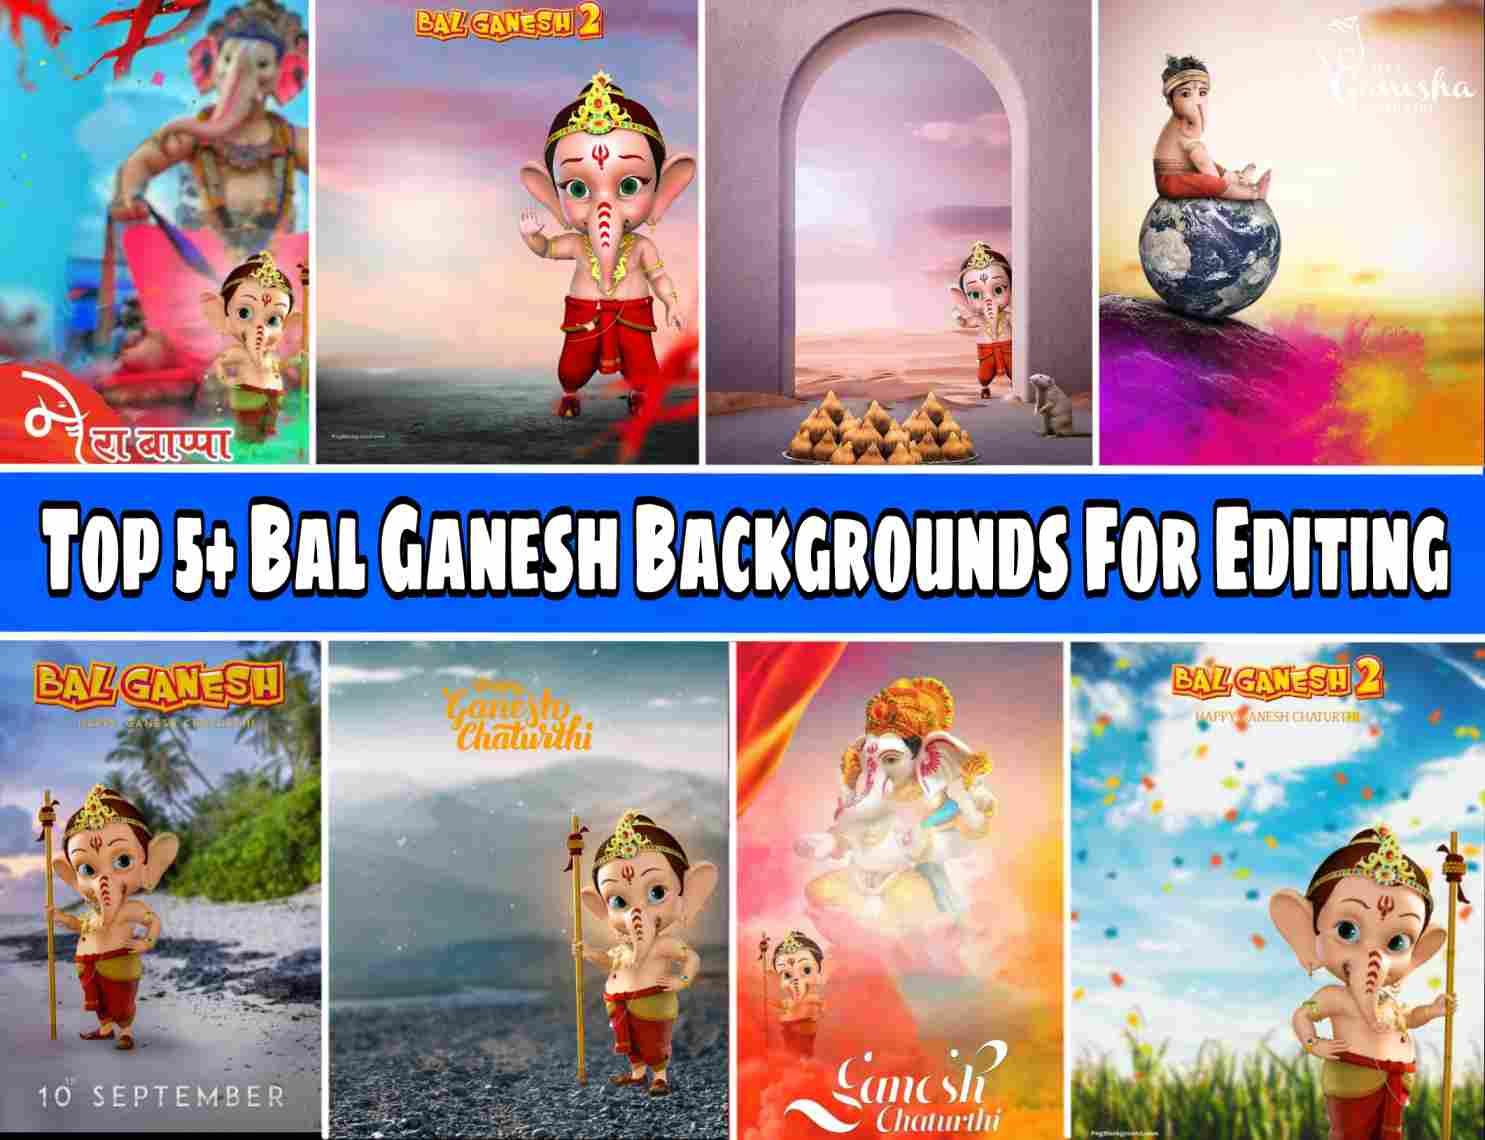 Bal Ganesh Background